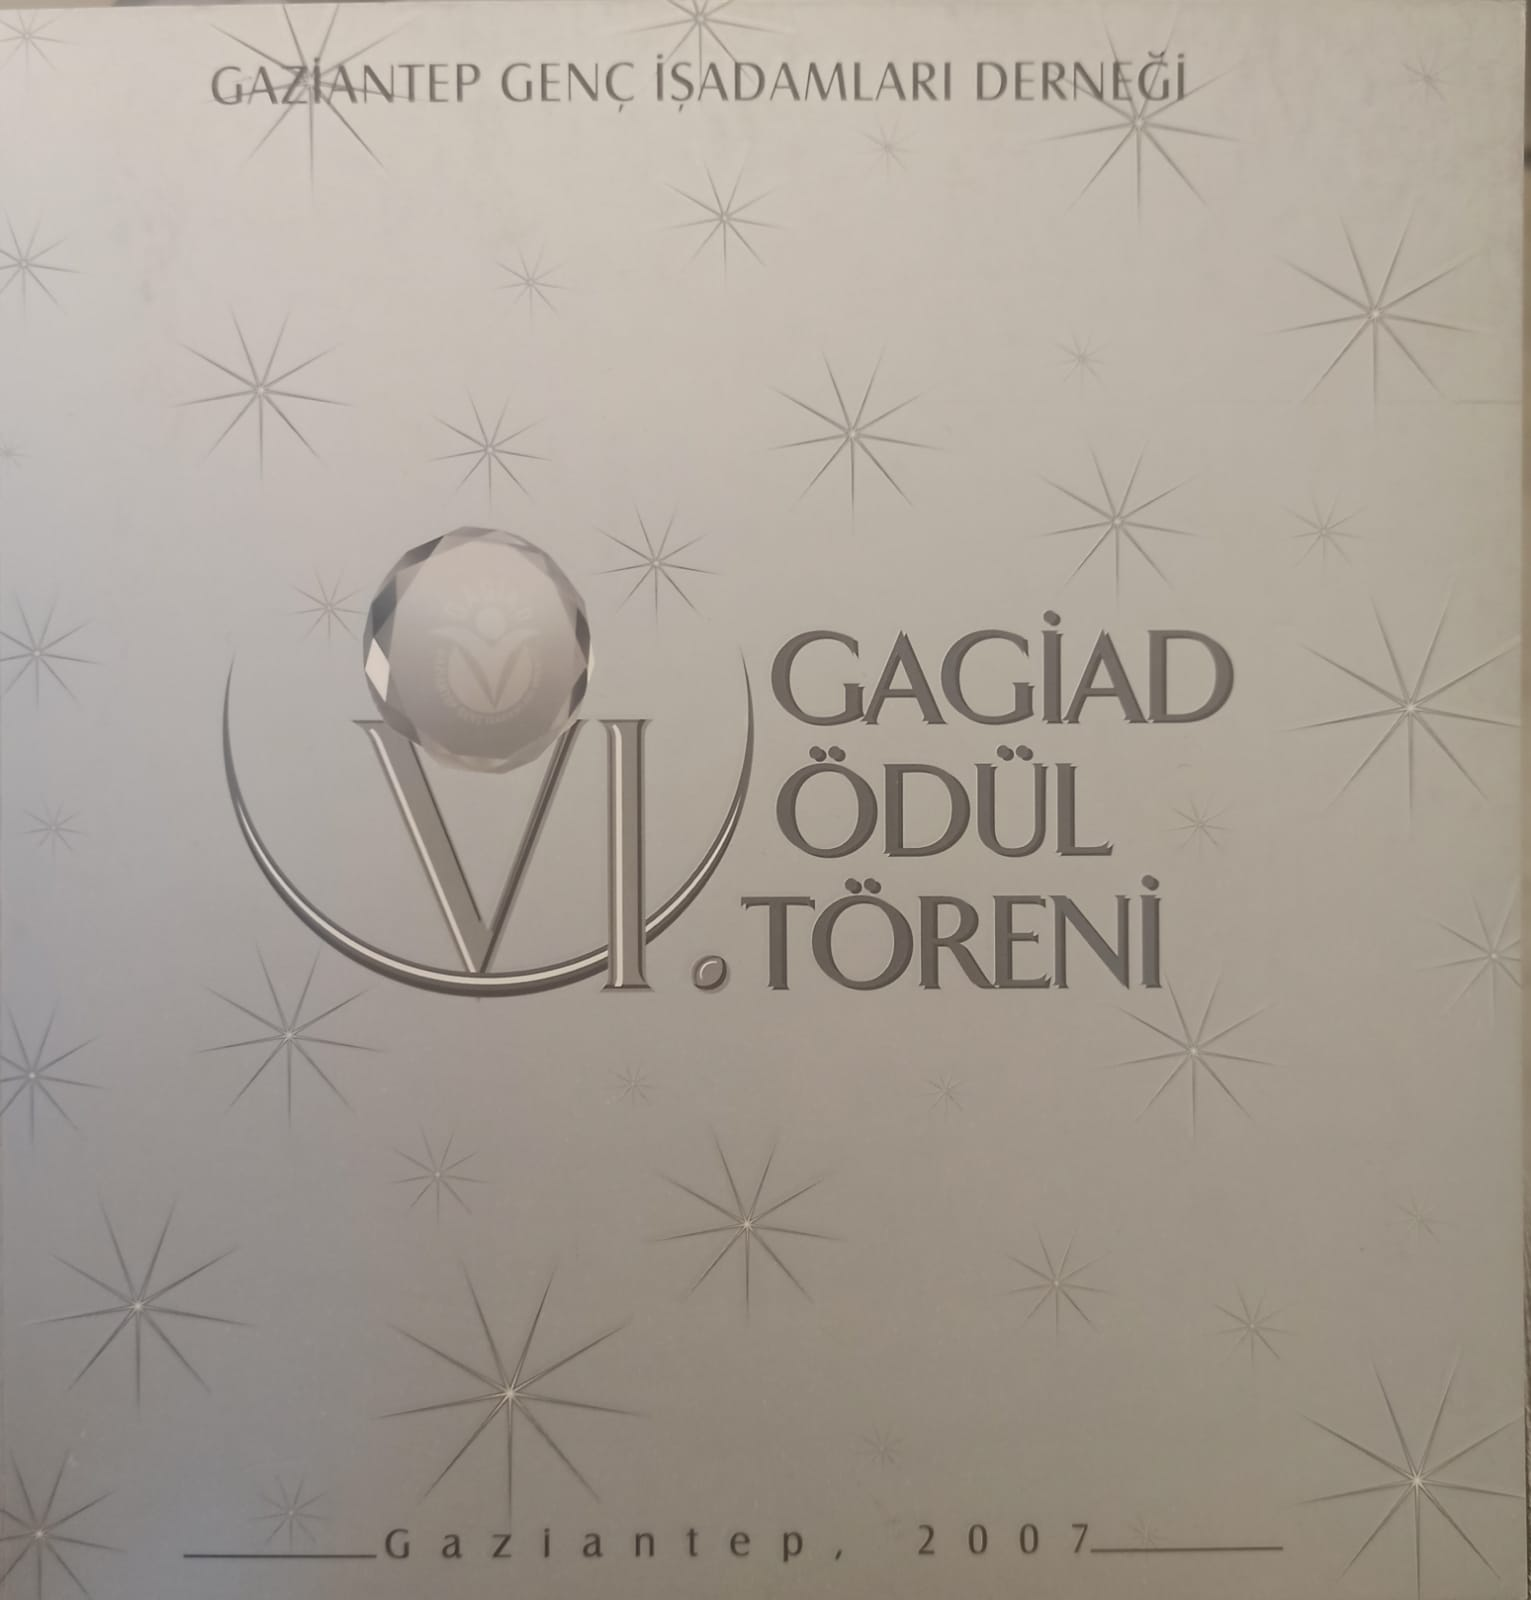 GAGİAD VI.ÖDÜL TÖRENİ